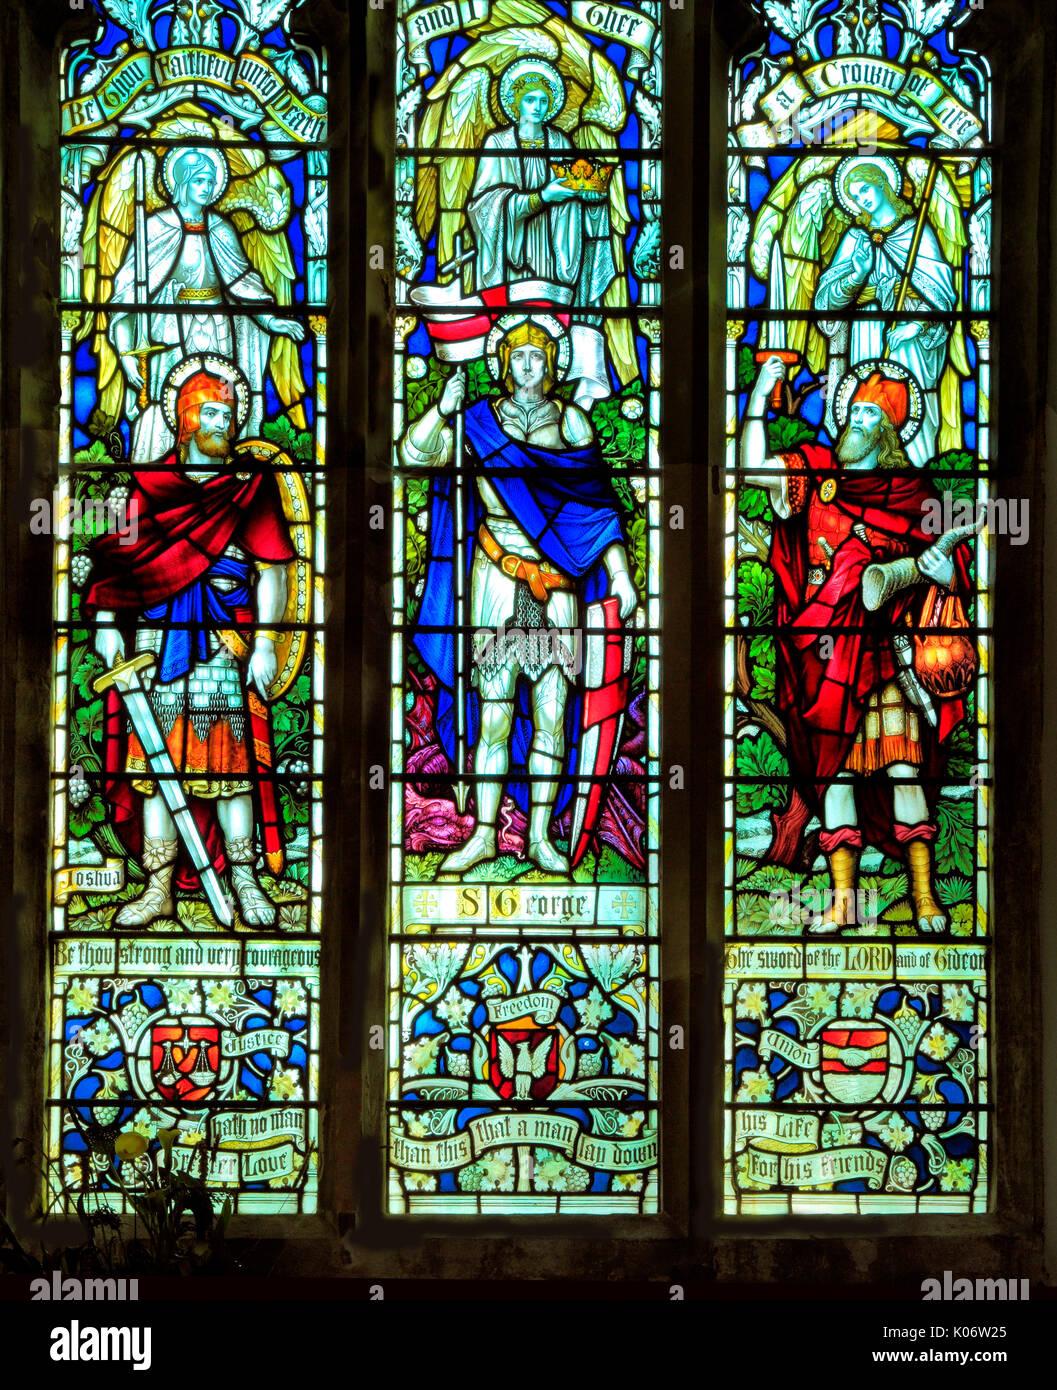 Joshua, St. George, Gideon, stained glass window, All Saints church, Warham, Norfolk, England, UK Stock Photo